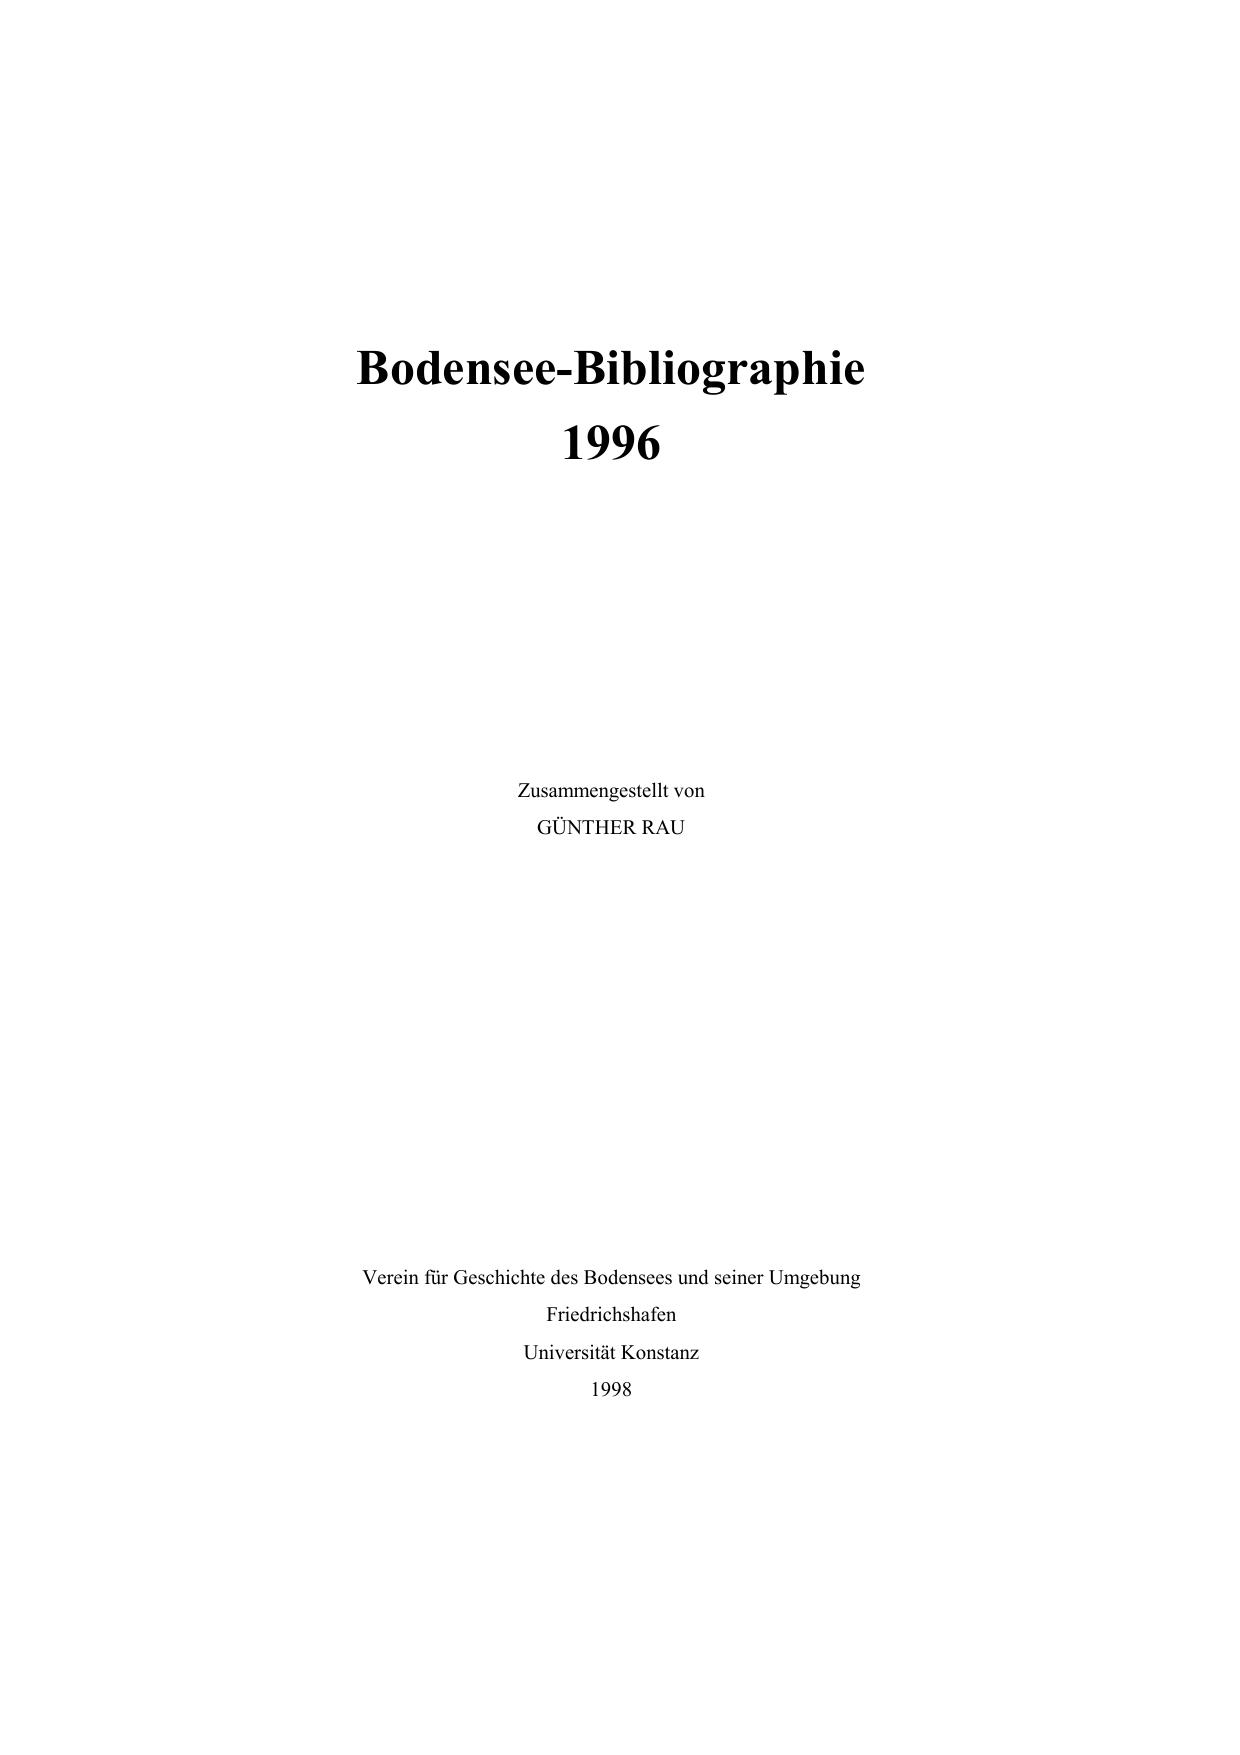 Bodensee Bibliographie 1996 Kops Manualzzcom